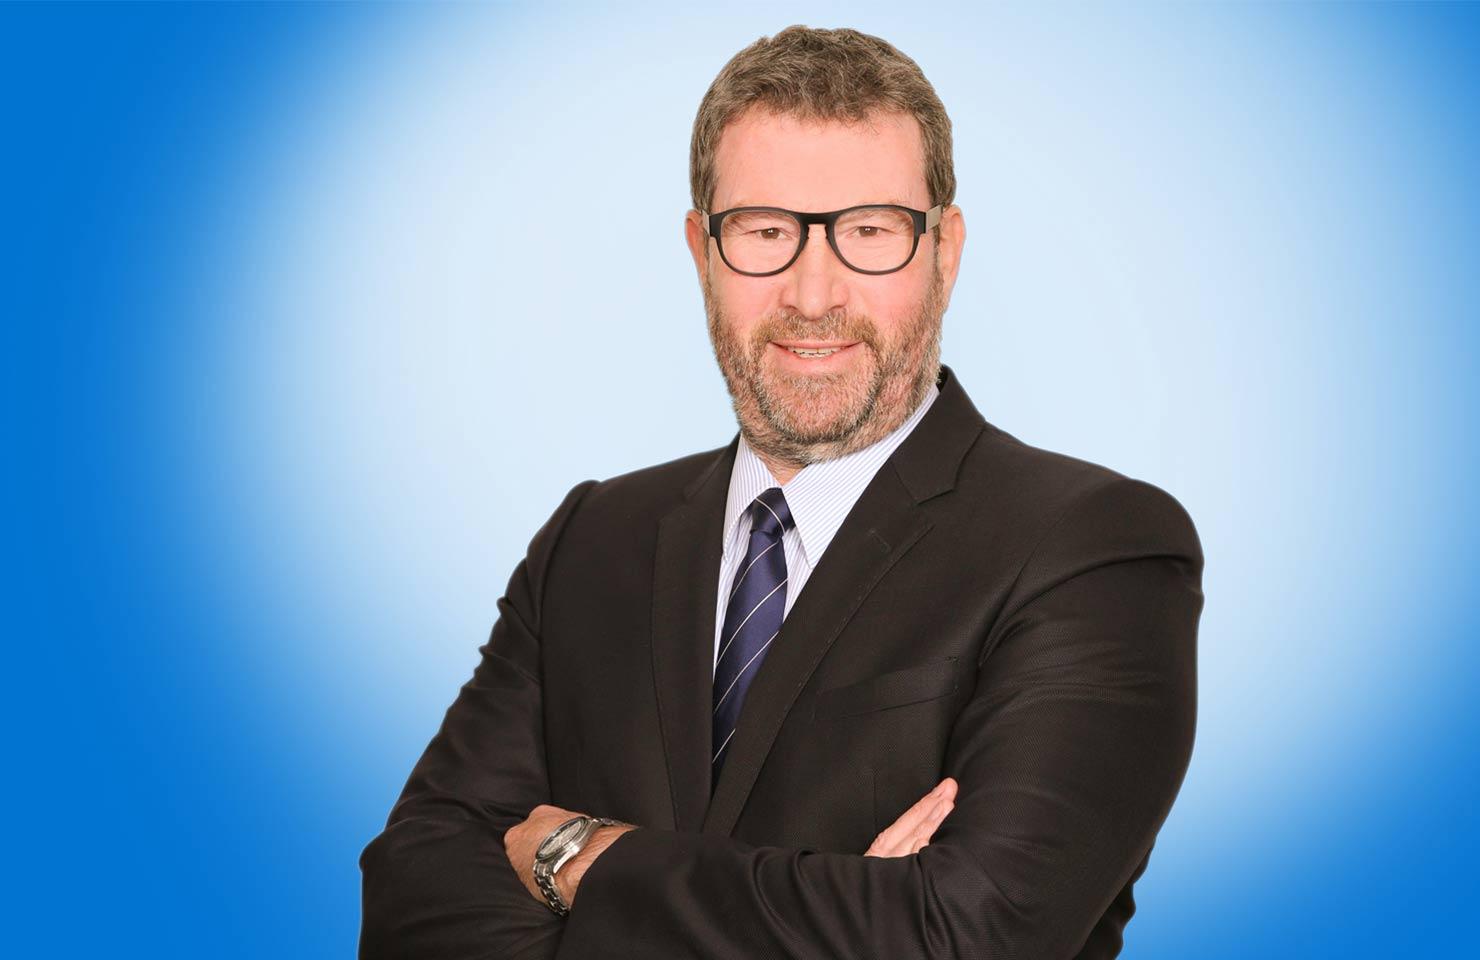 Peter Joos, Rechtsanwalt Dipl.-Betriebswirt (FH) Fachanwalt für Handels- und Gesellschaftsrecht, Konstanz